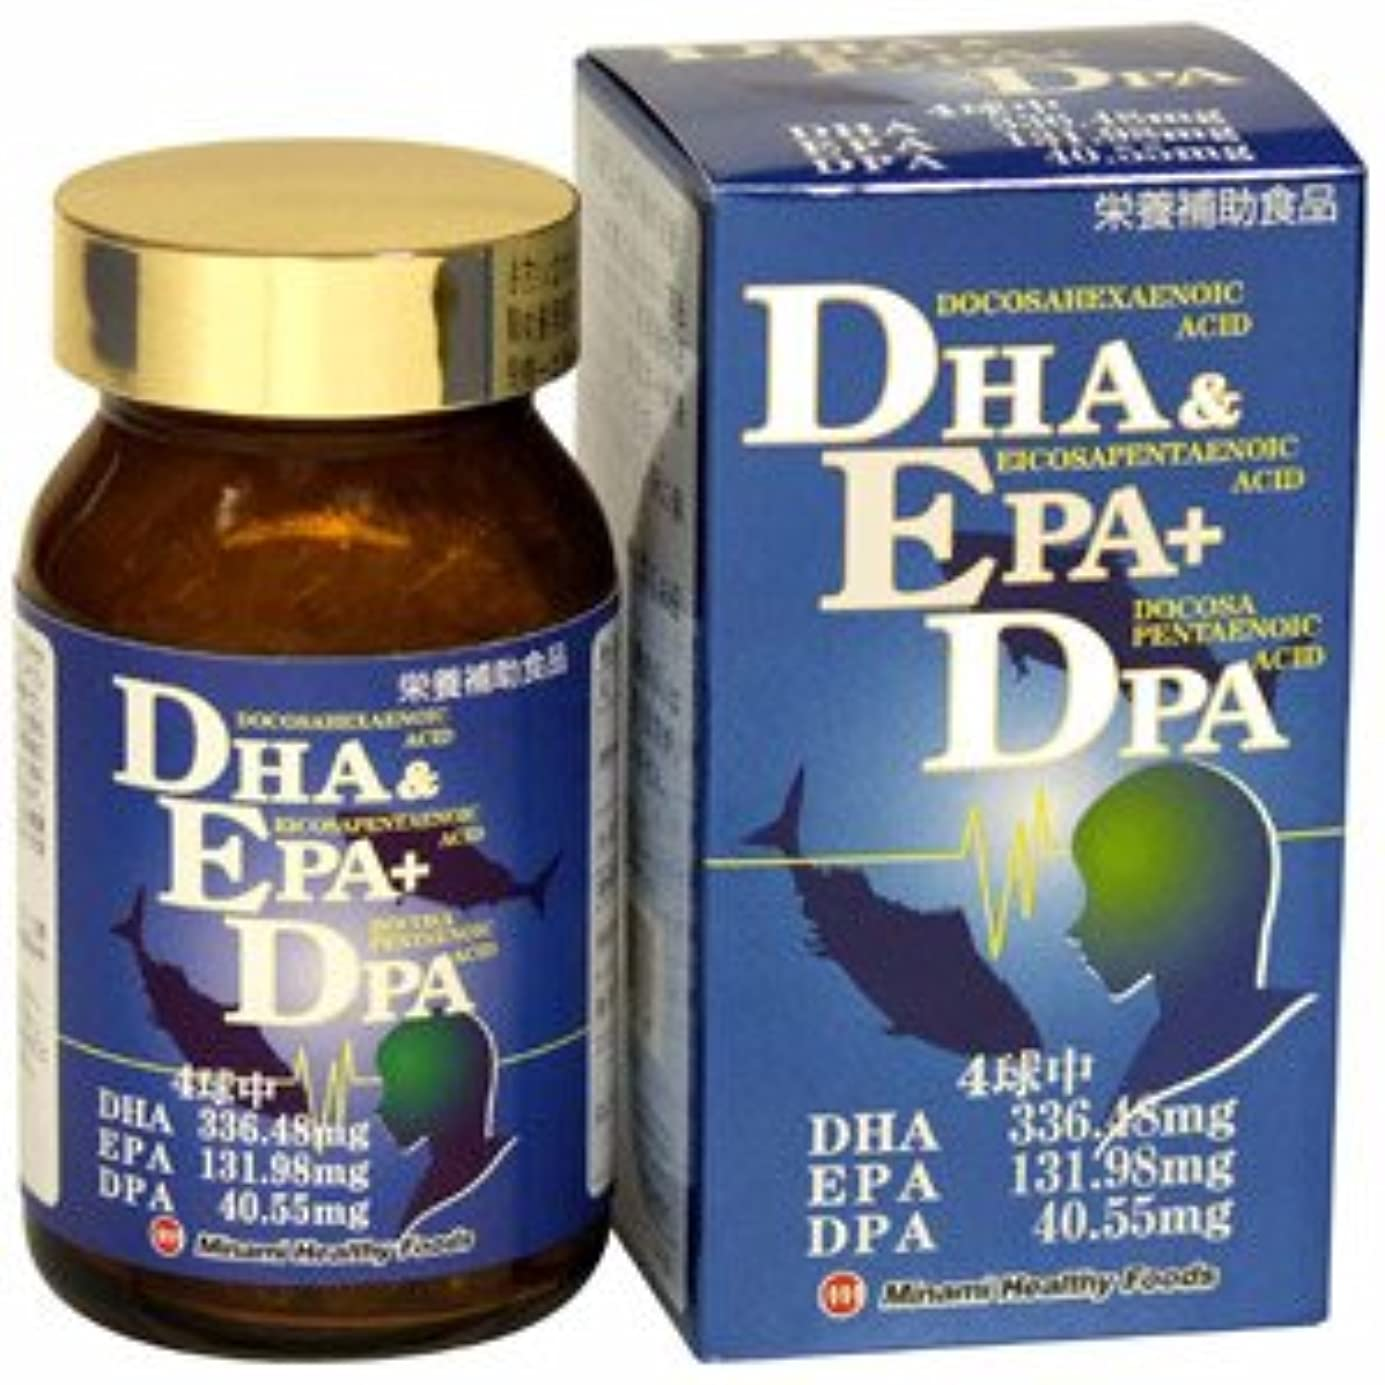 DHA&EPA+DPA(単品)ミナミヘルシーフーズ